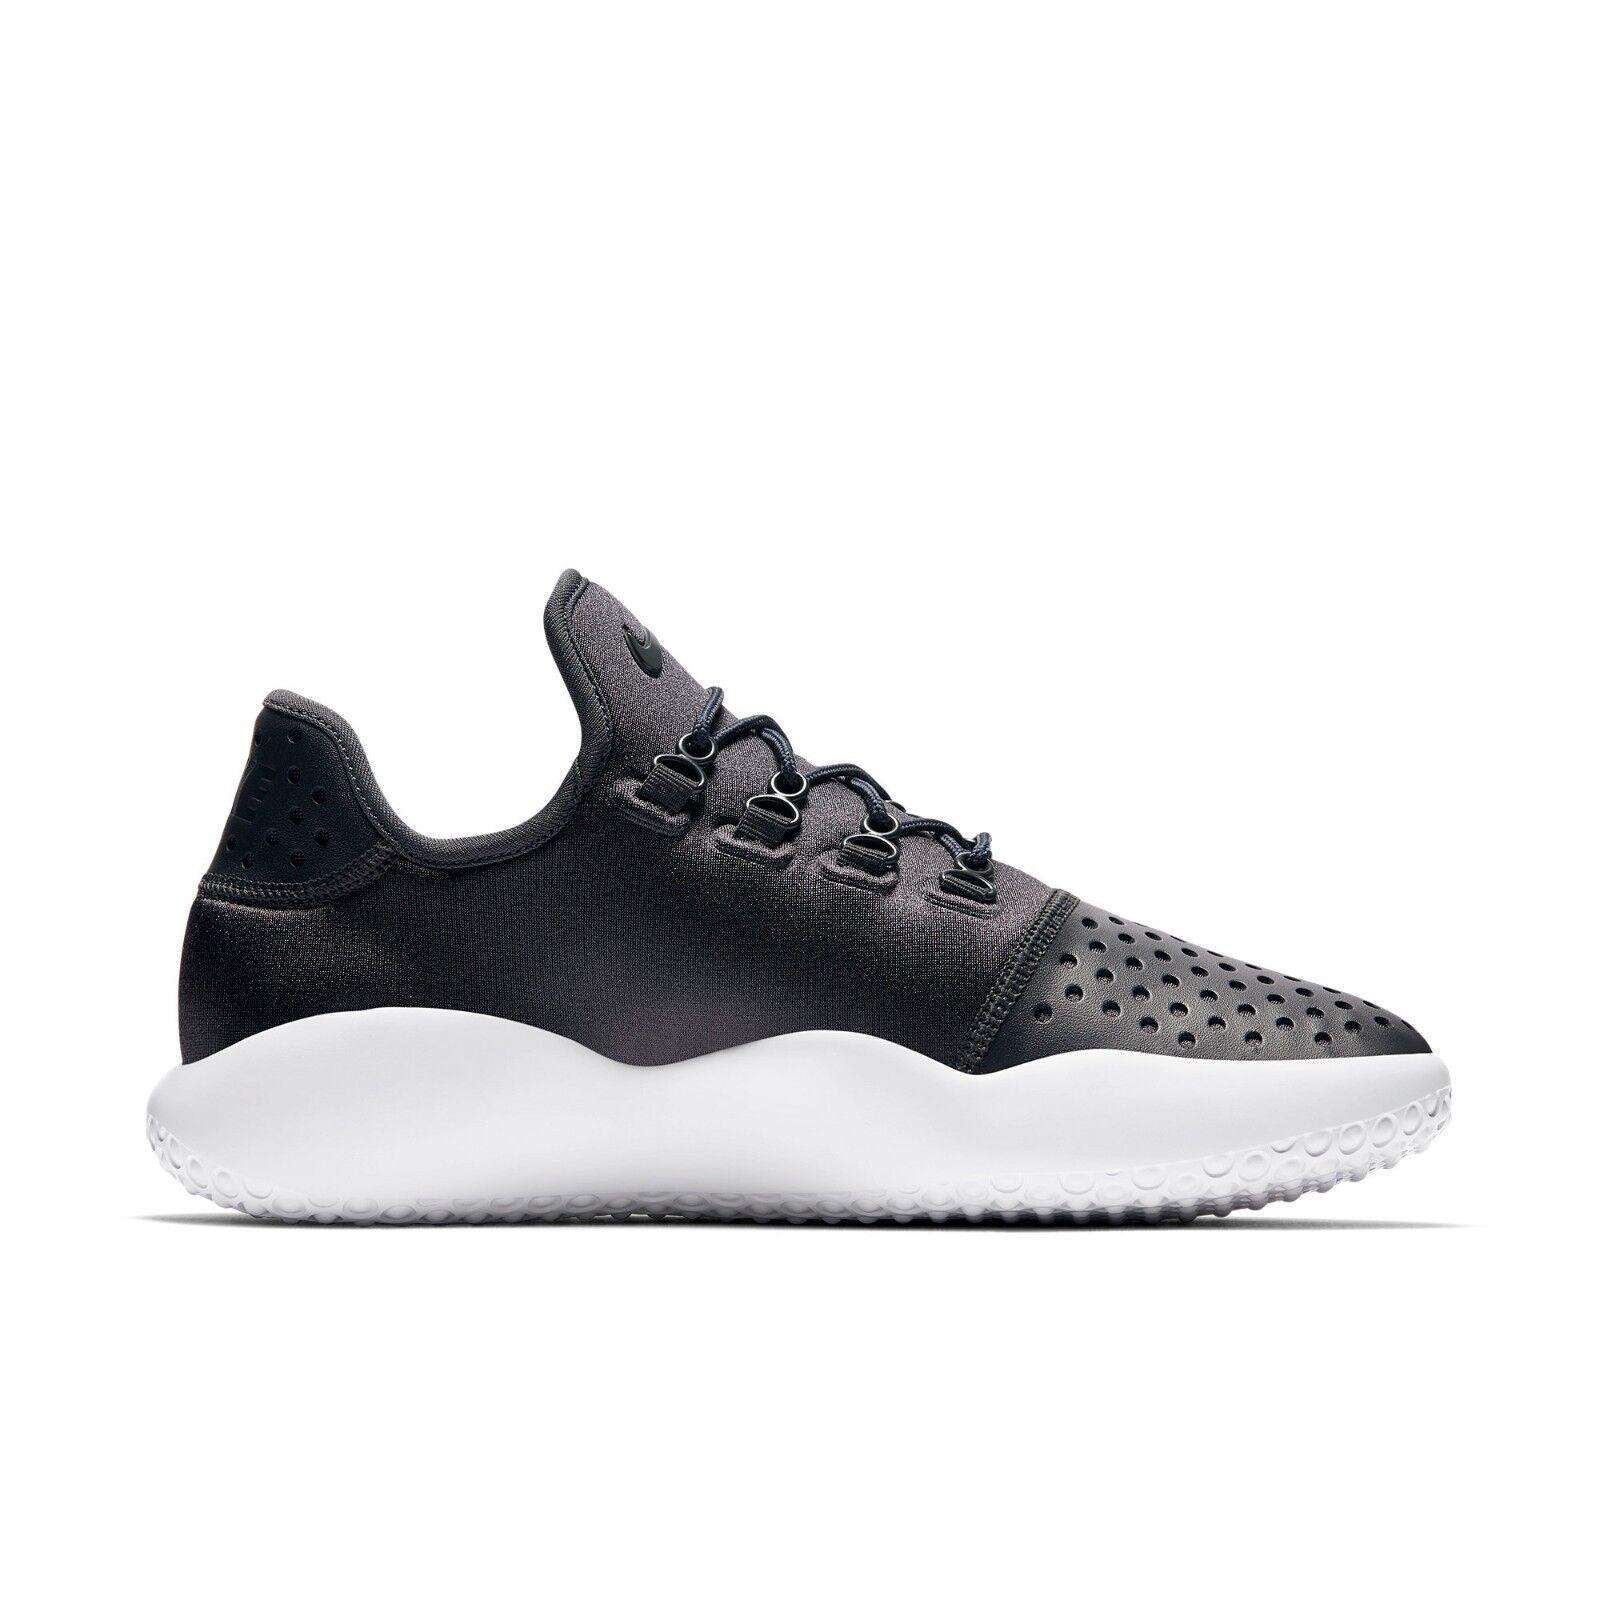 Nike FL-Rue Mens Hi Top entraîneur Chaussure Anthracite Blanc Size 7.5 - 11 RRP £ 80 New